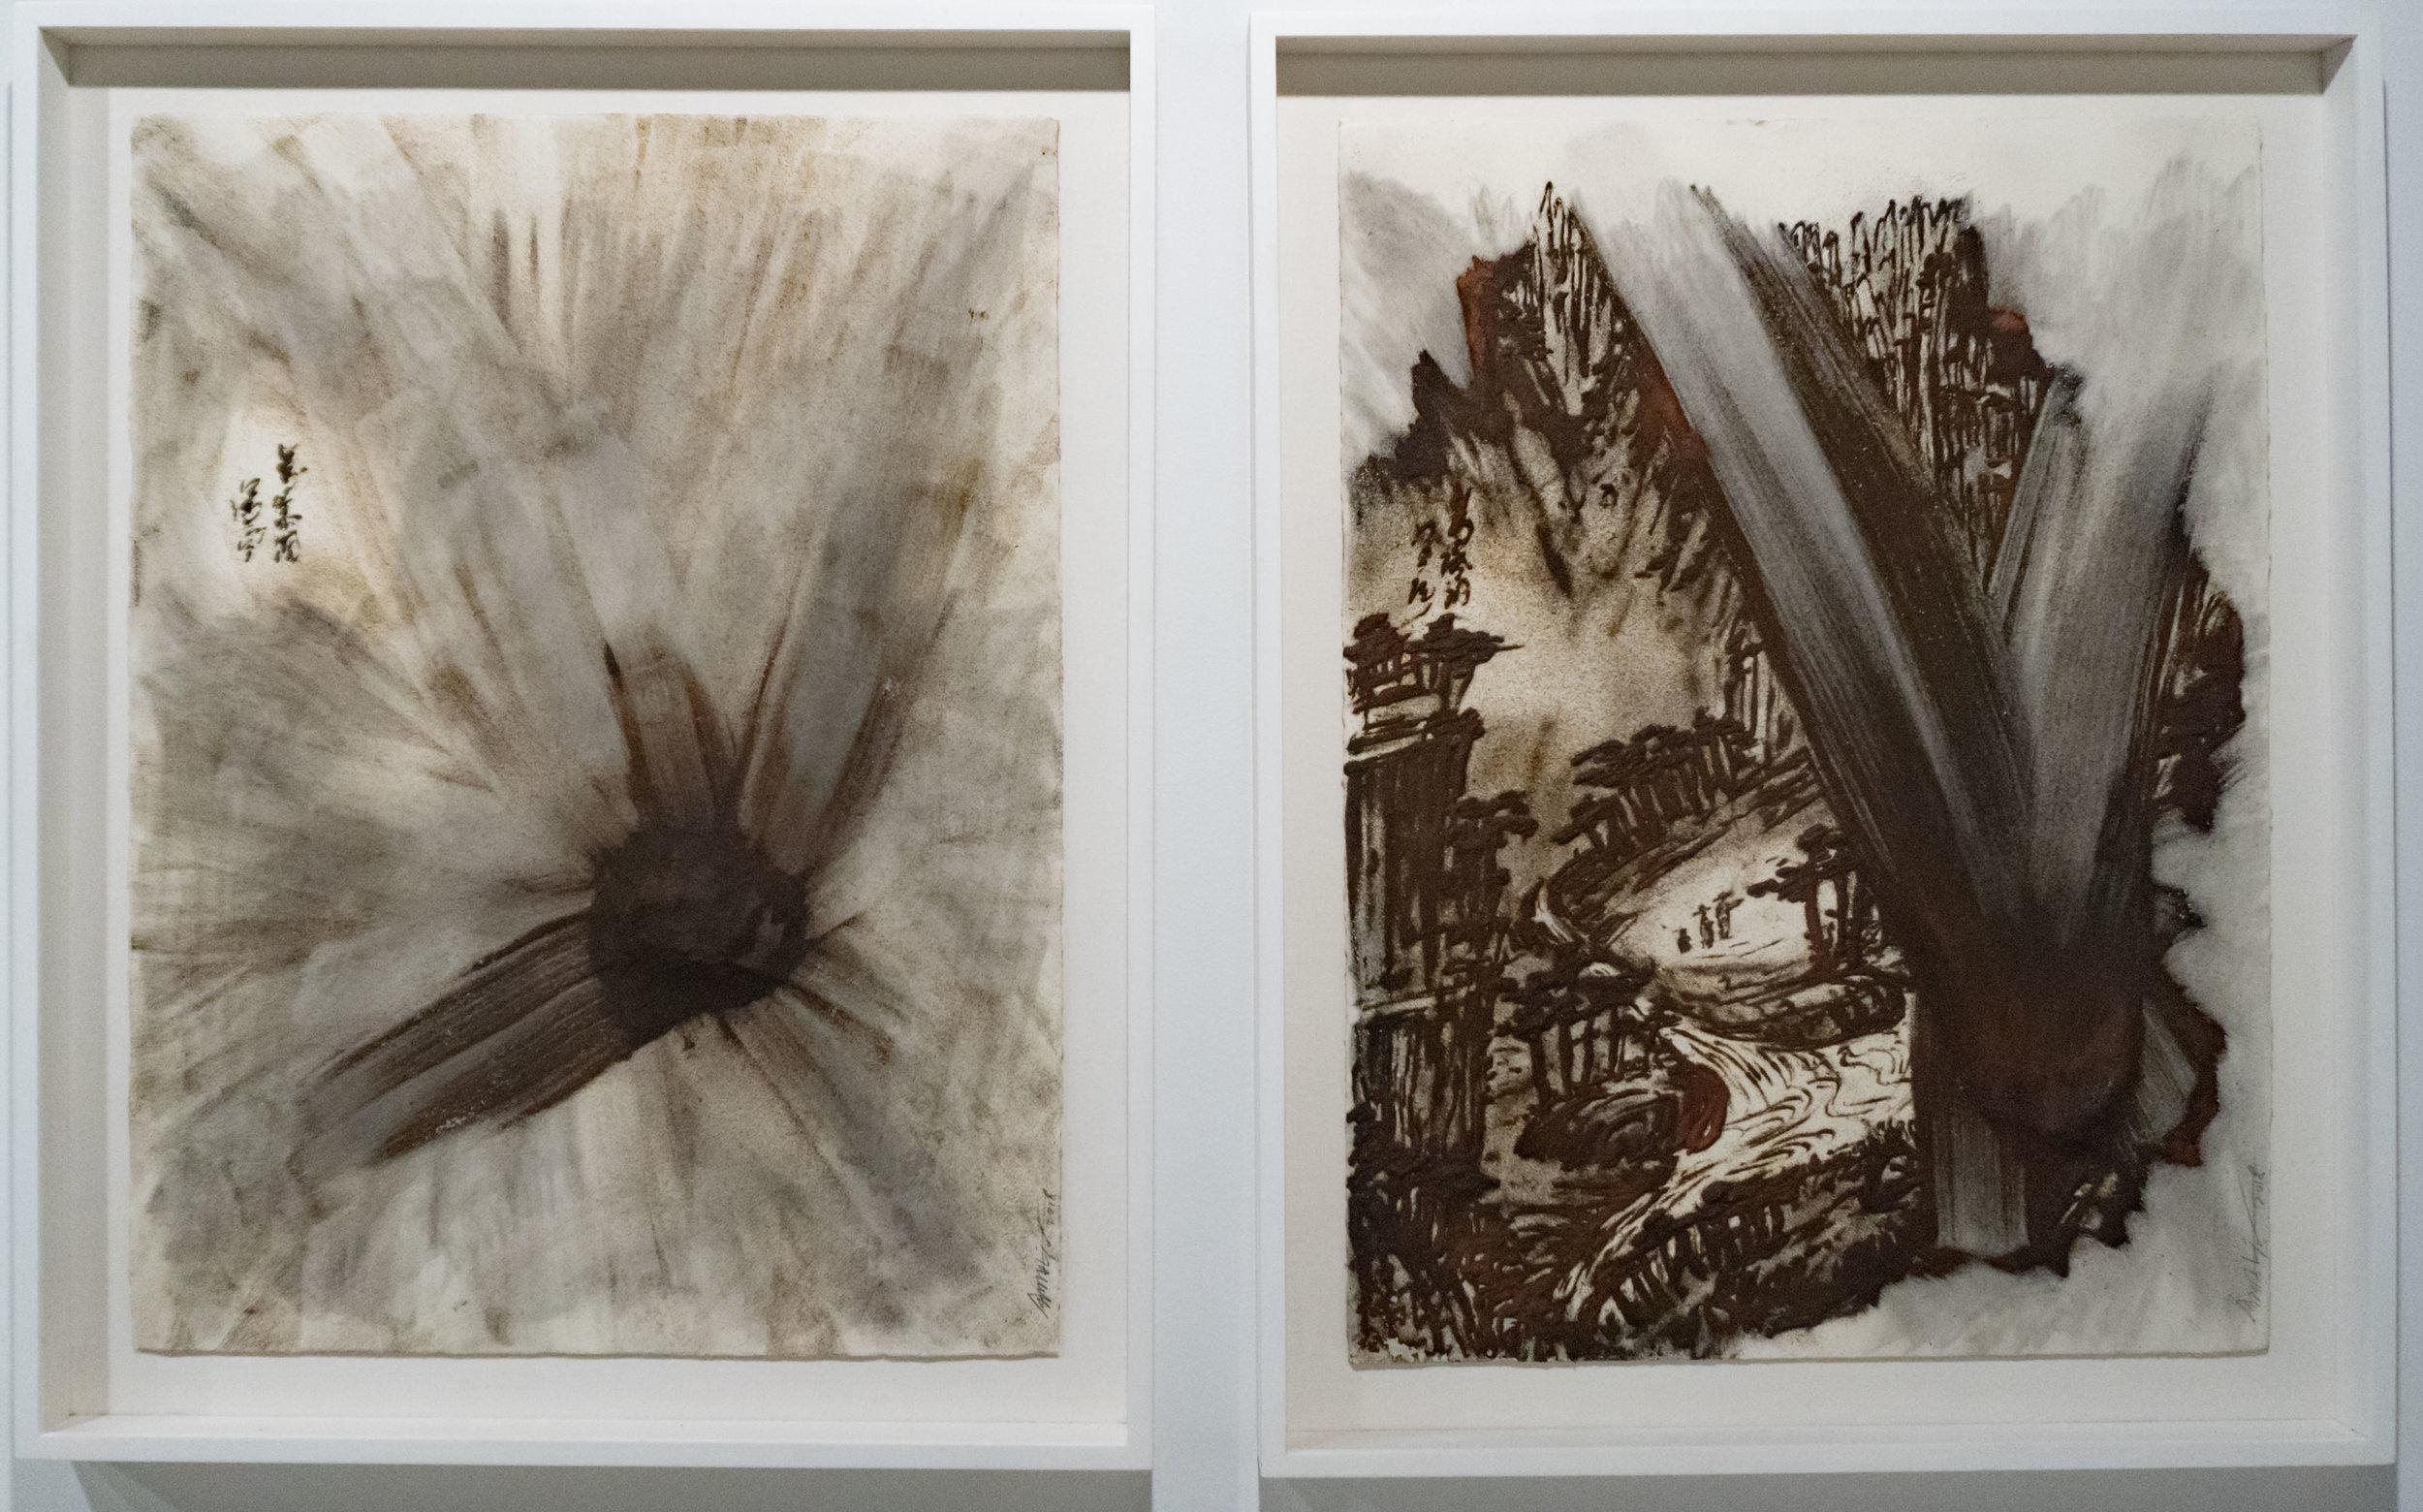 Kim Jongku김종구 b. 1963   Mahn Pok Dong 만폭동 2018 Iron dust, PV glue, canvas 17 ¾ x 25 ½ in